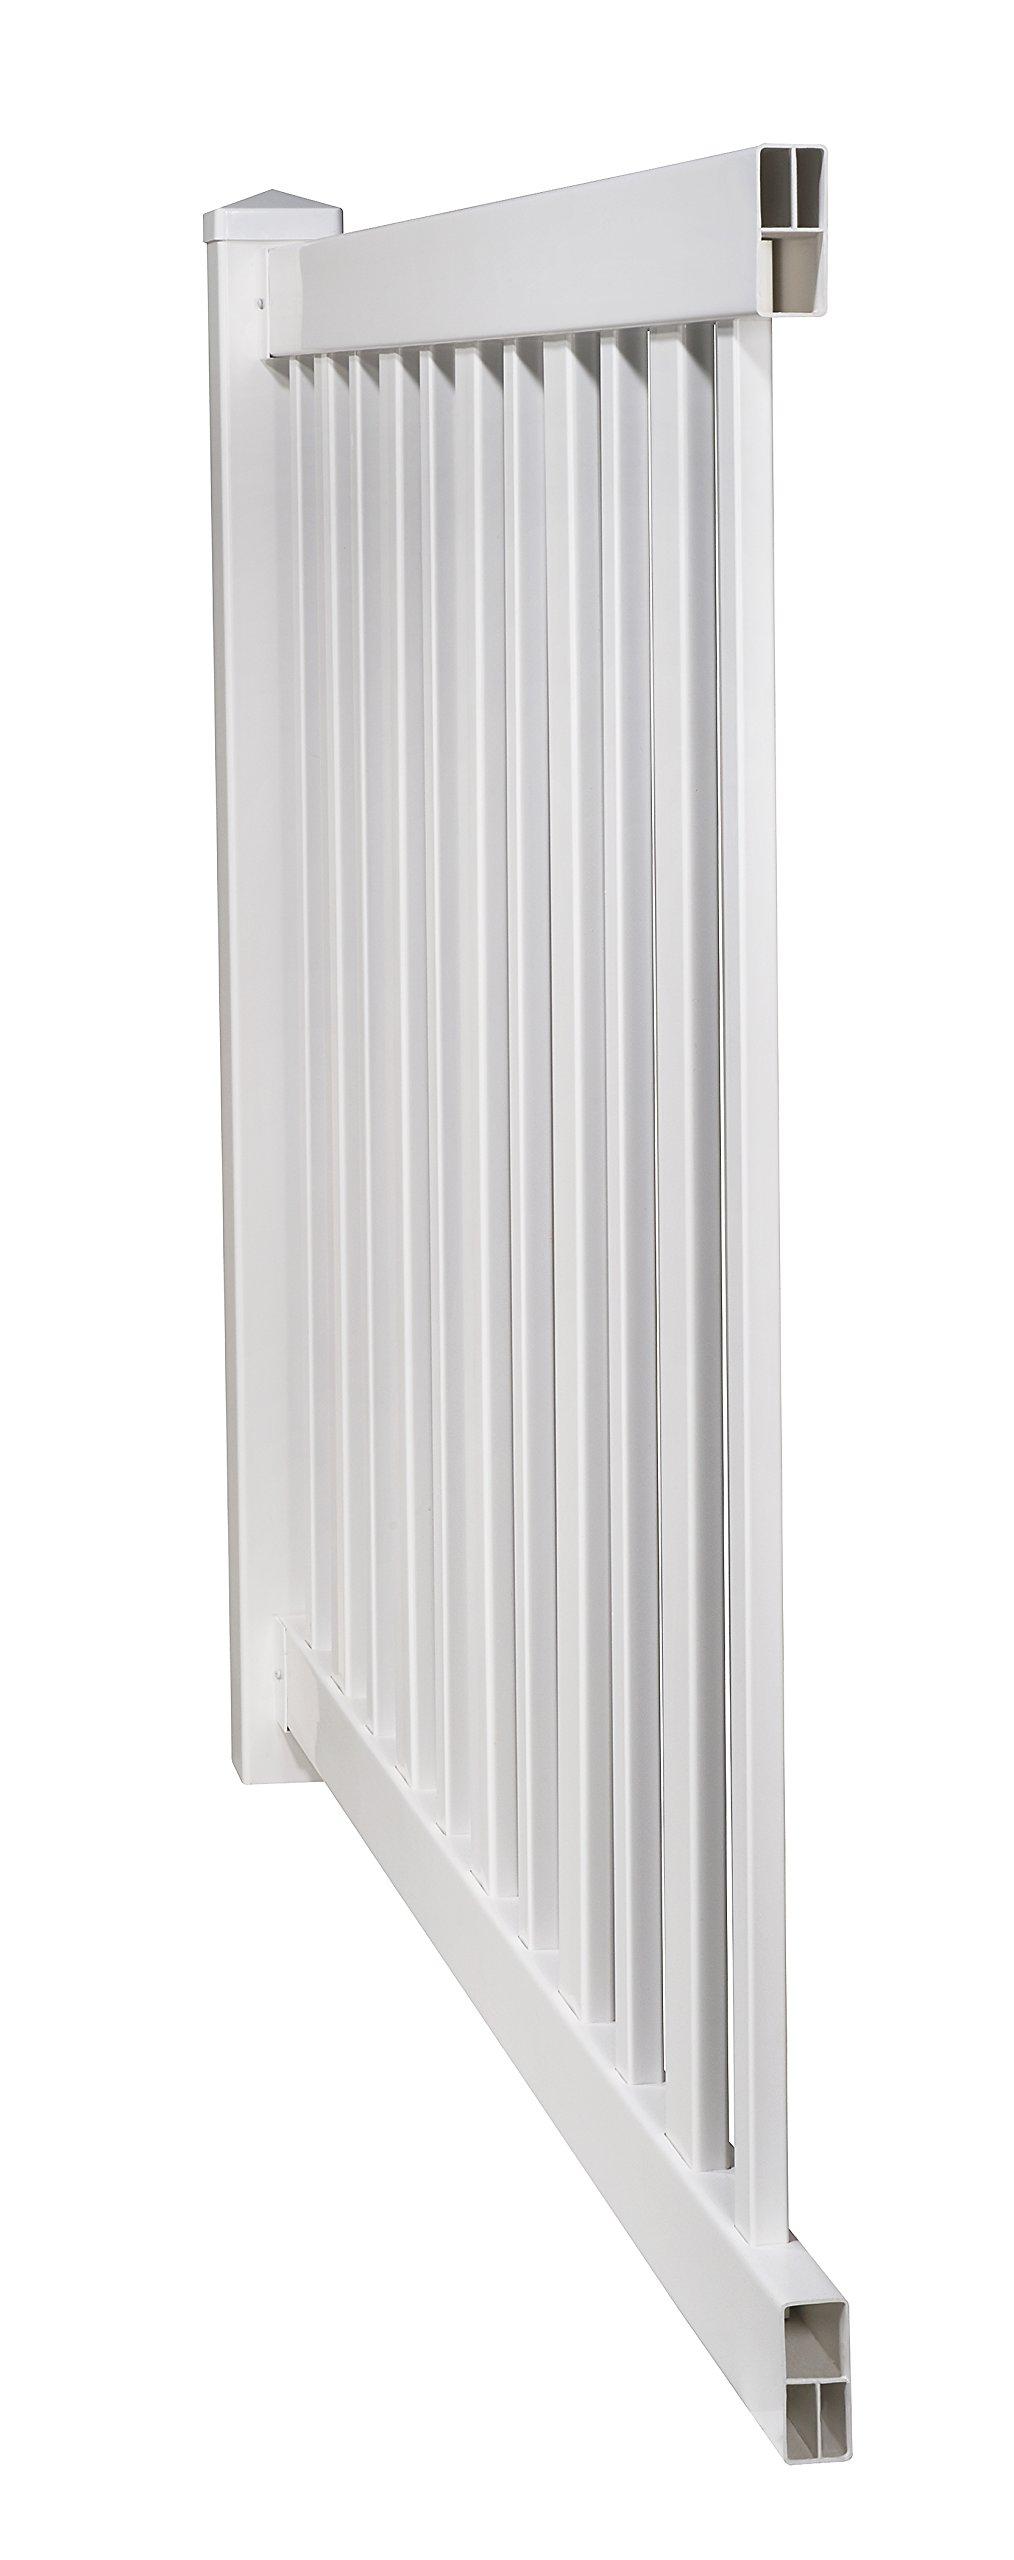 WamBam No-Dig BL19103 Sturbridge Vinyl Fence, 4' Tall by 6' Wide White